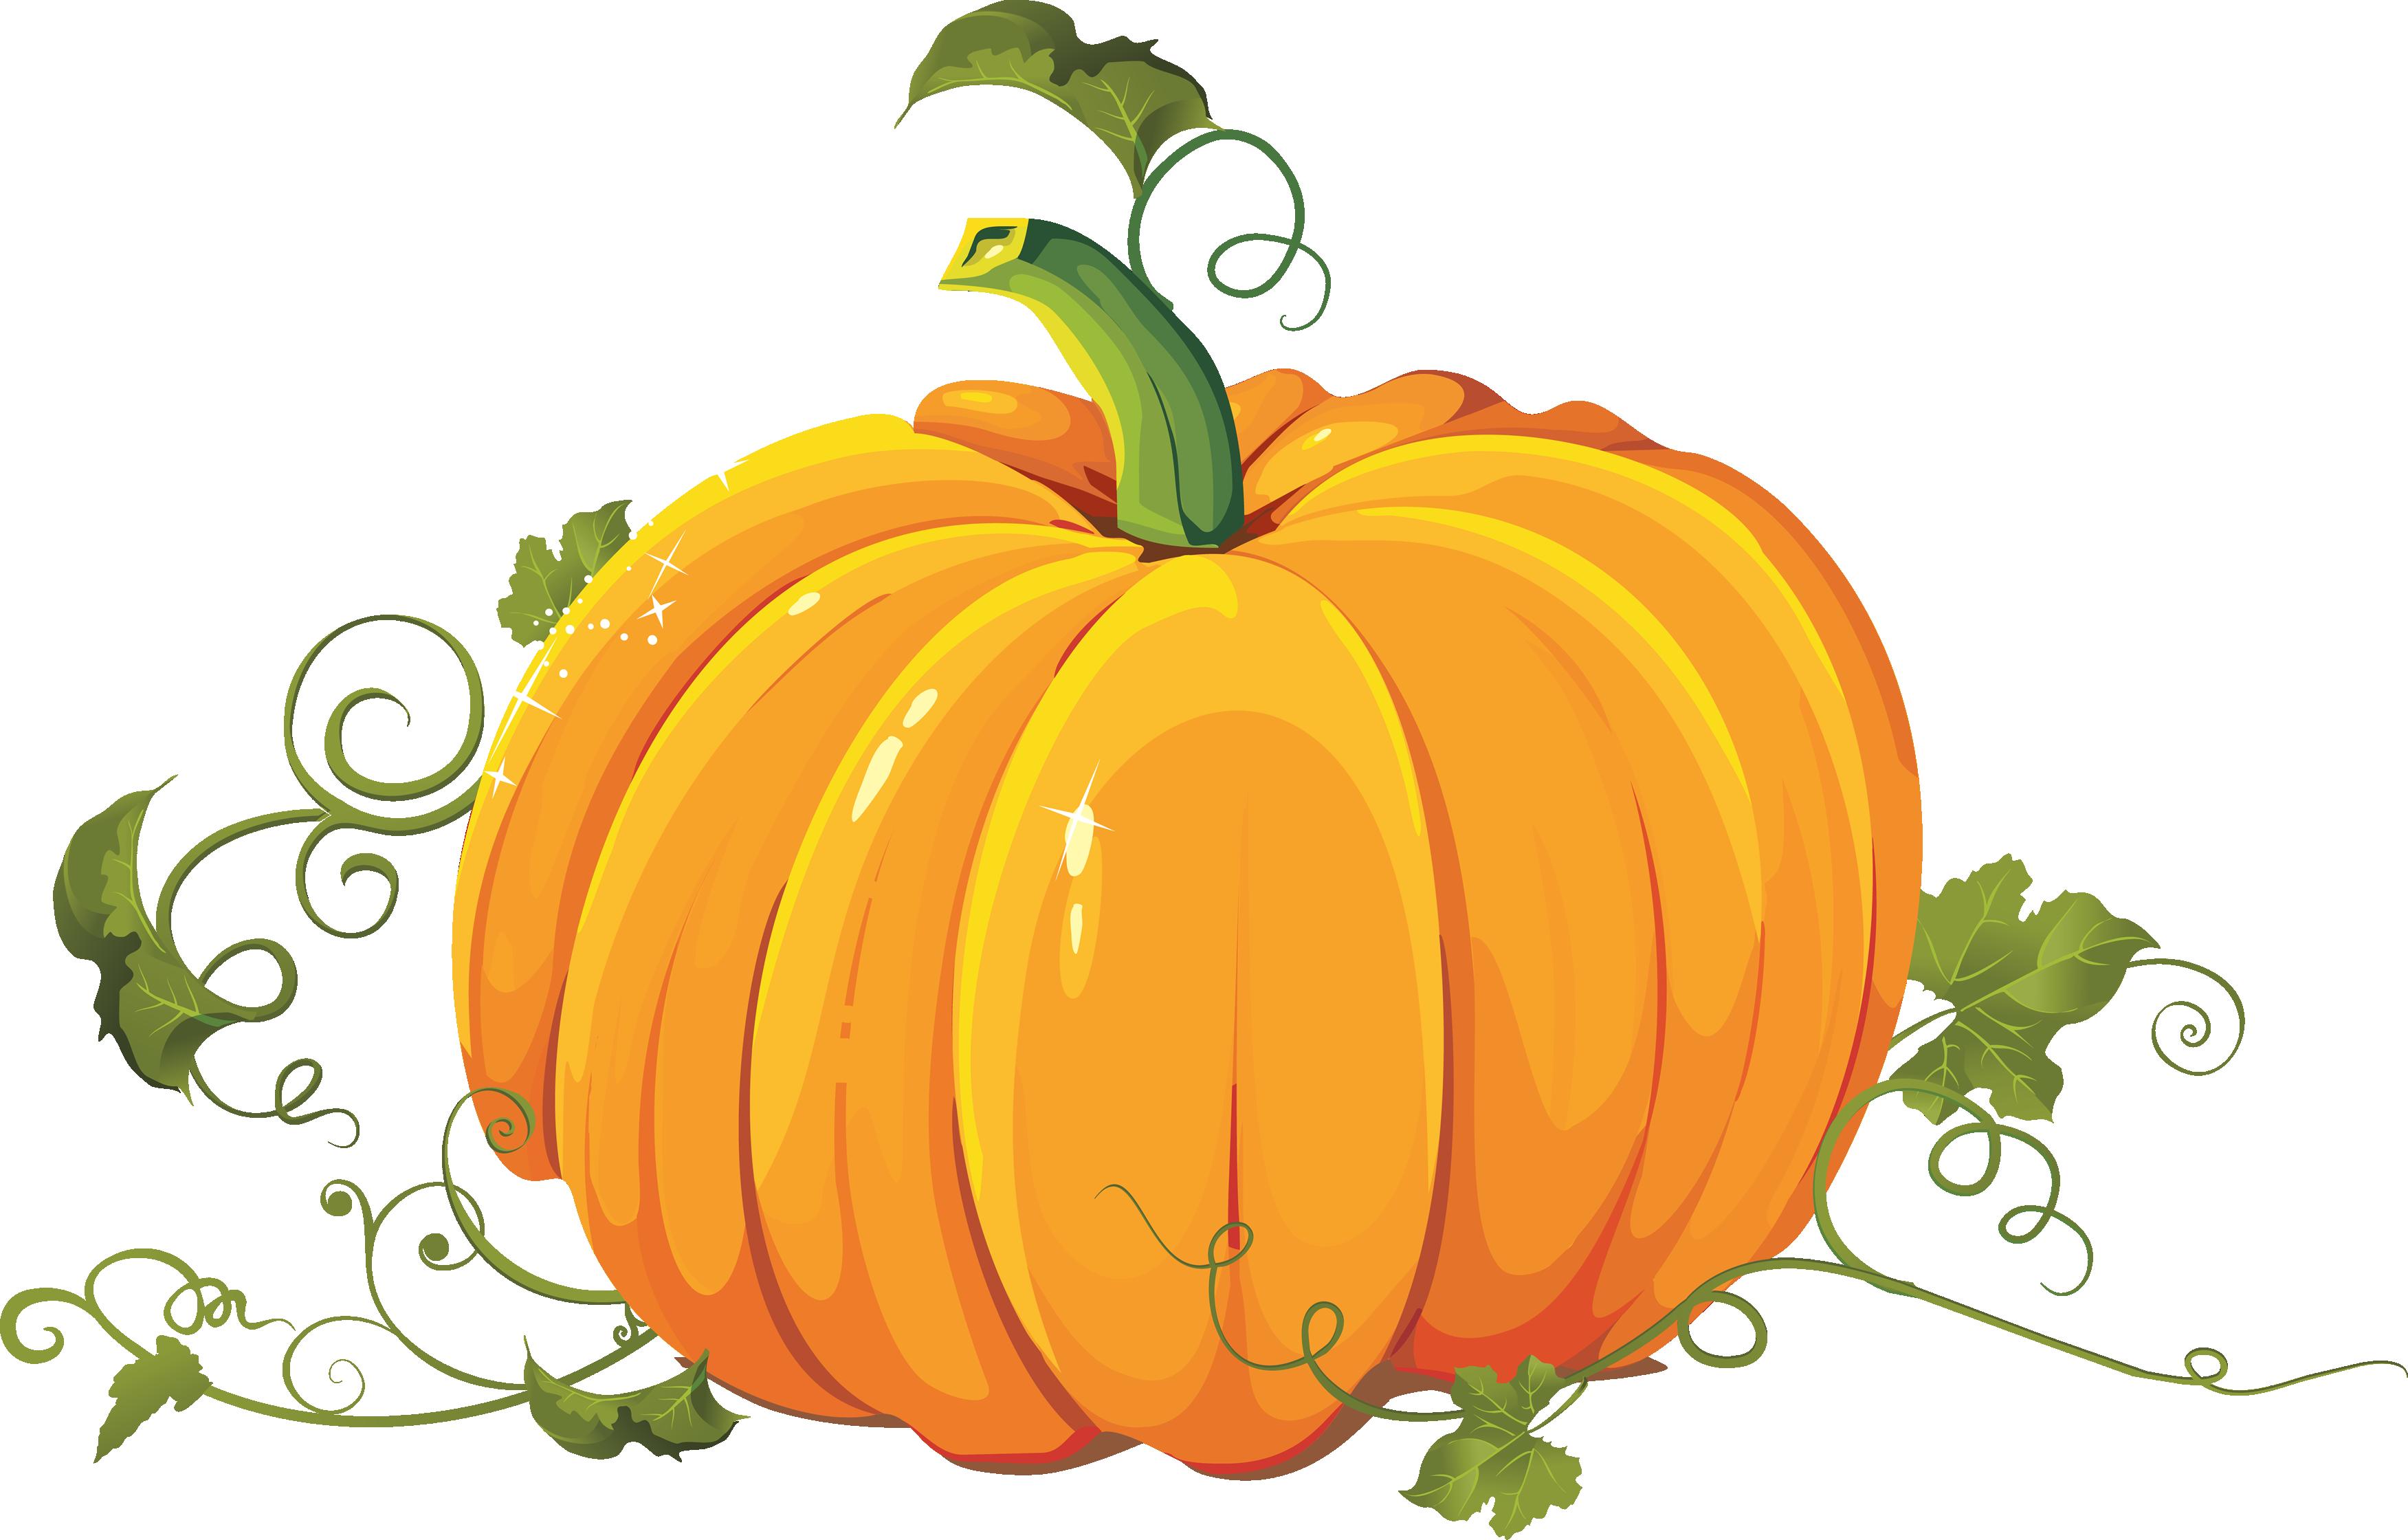 Png images free download. Clipart pumpkin garden